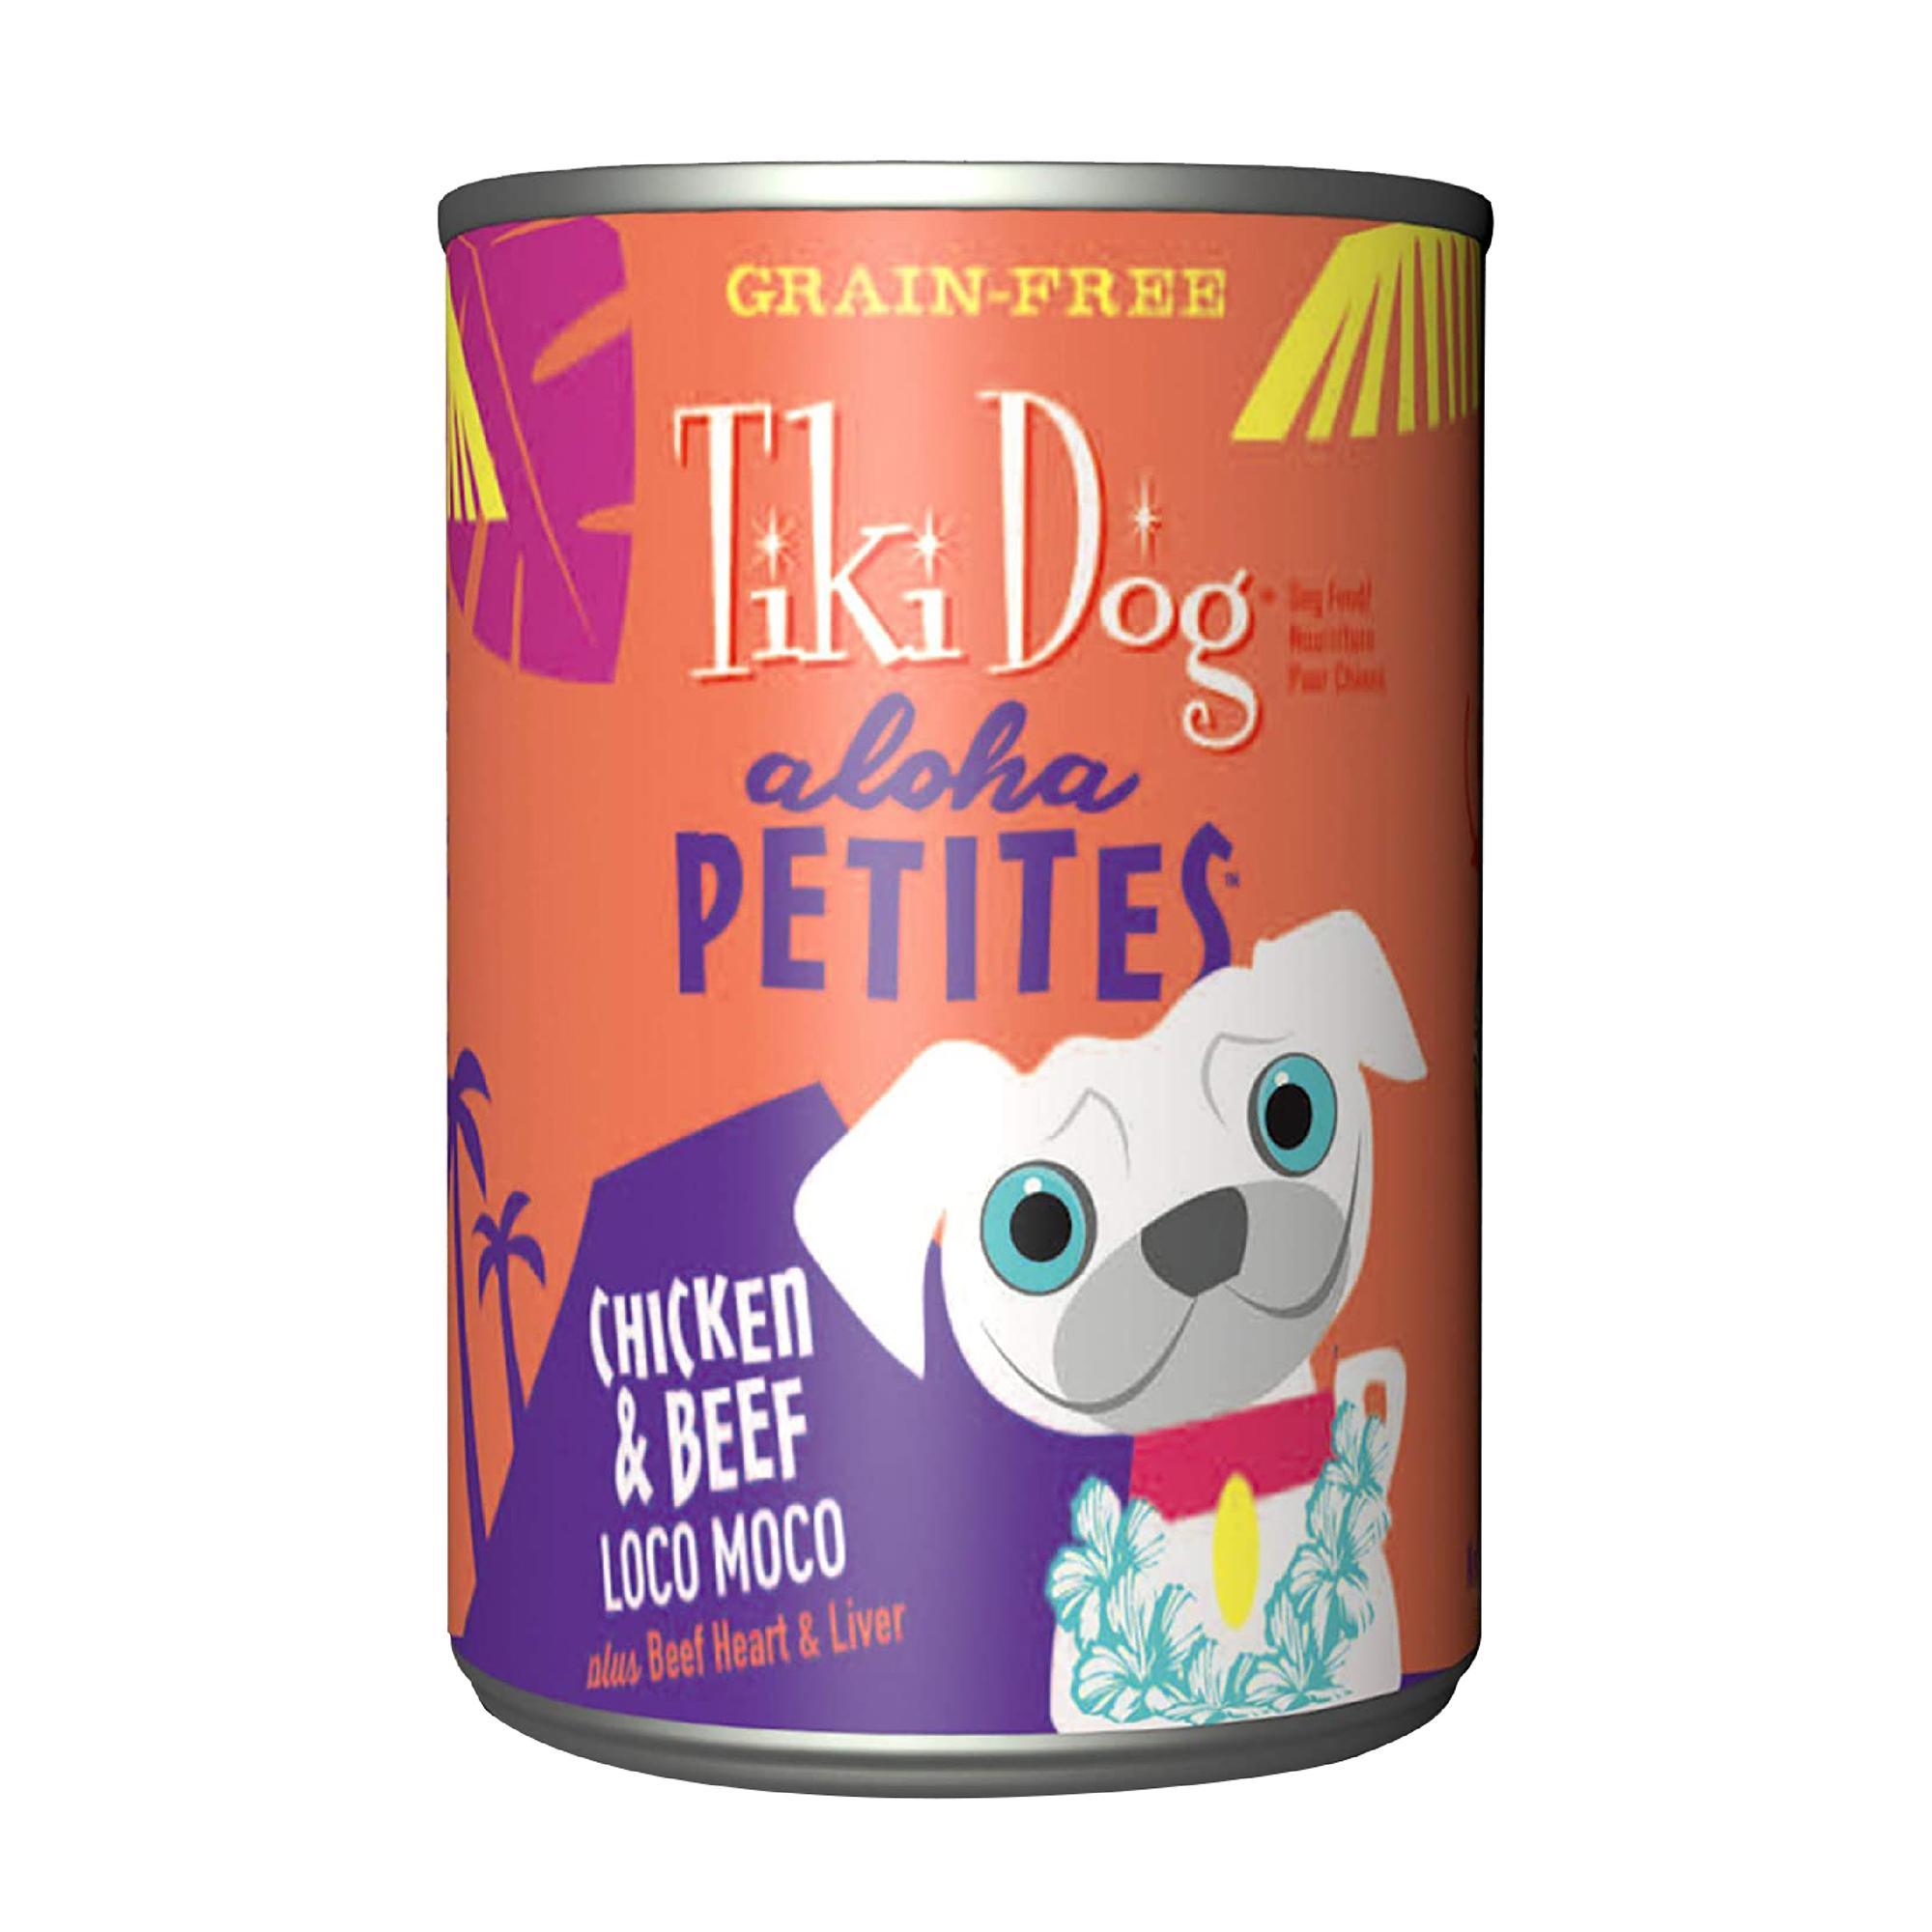 Tiki Dog Aloha Petites Chicken & Beef Loco Moco Wet Dog Food, 9-oz can, case of 8